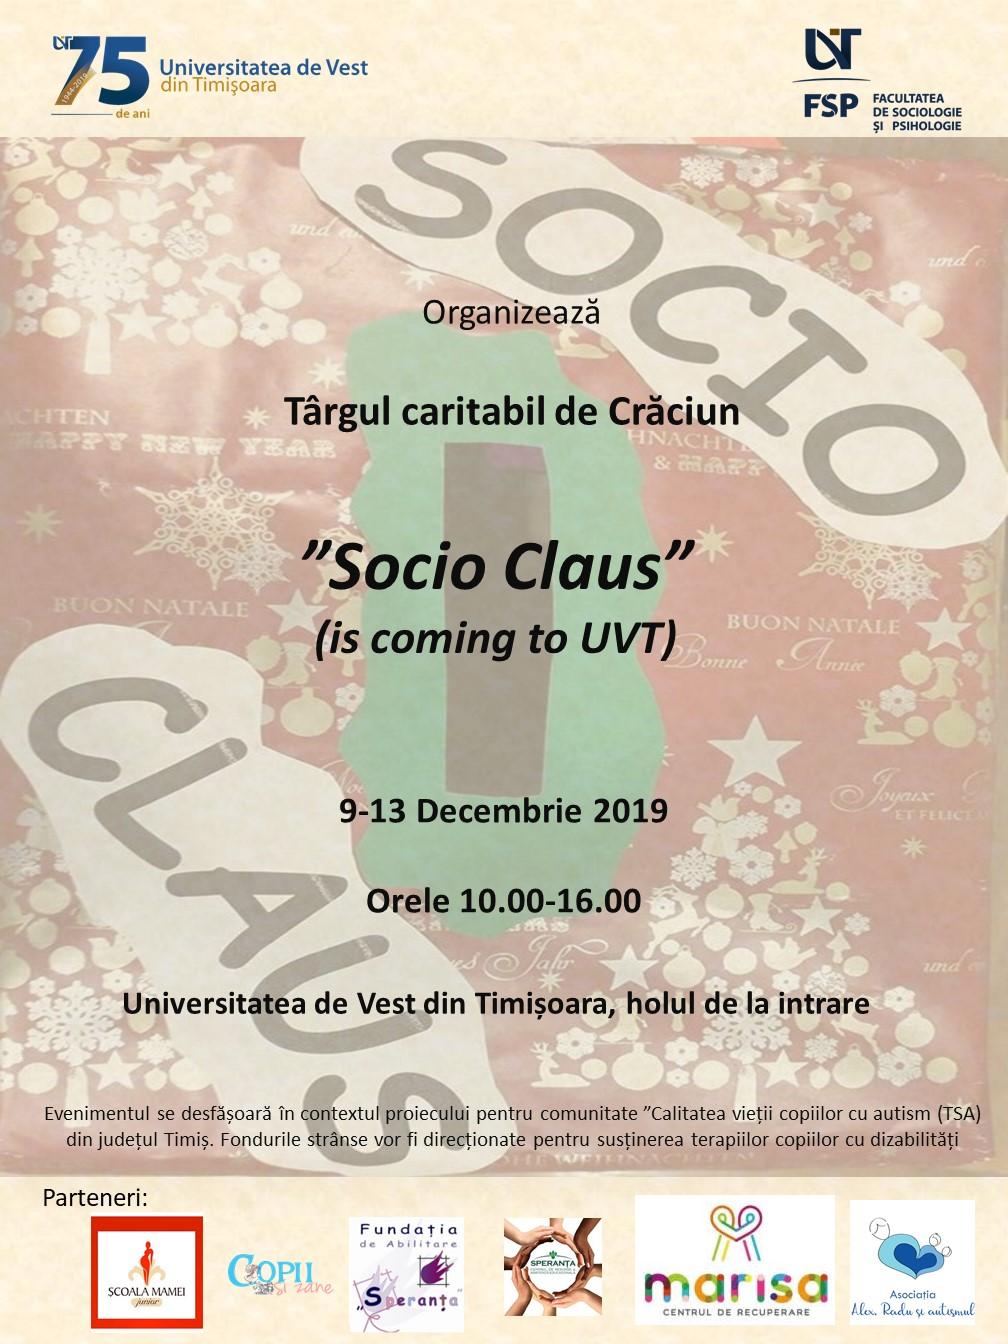 Socio Claus